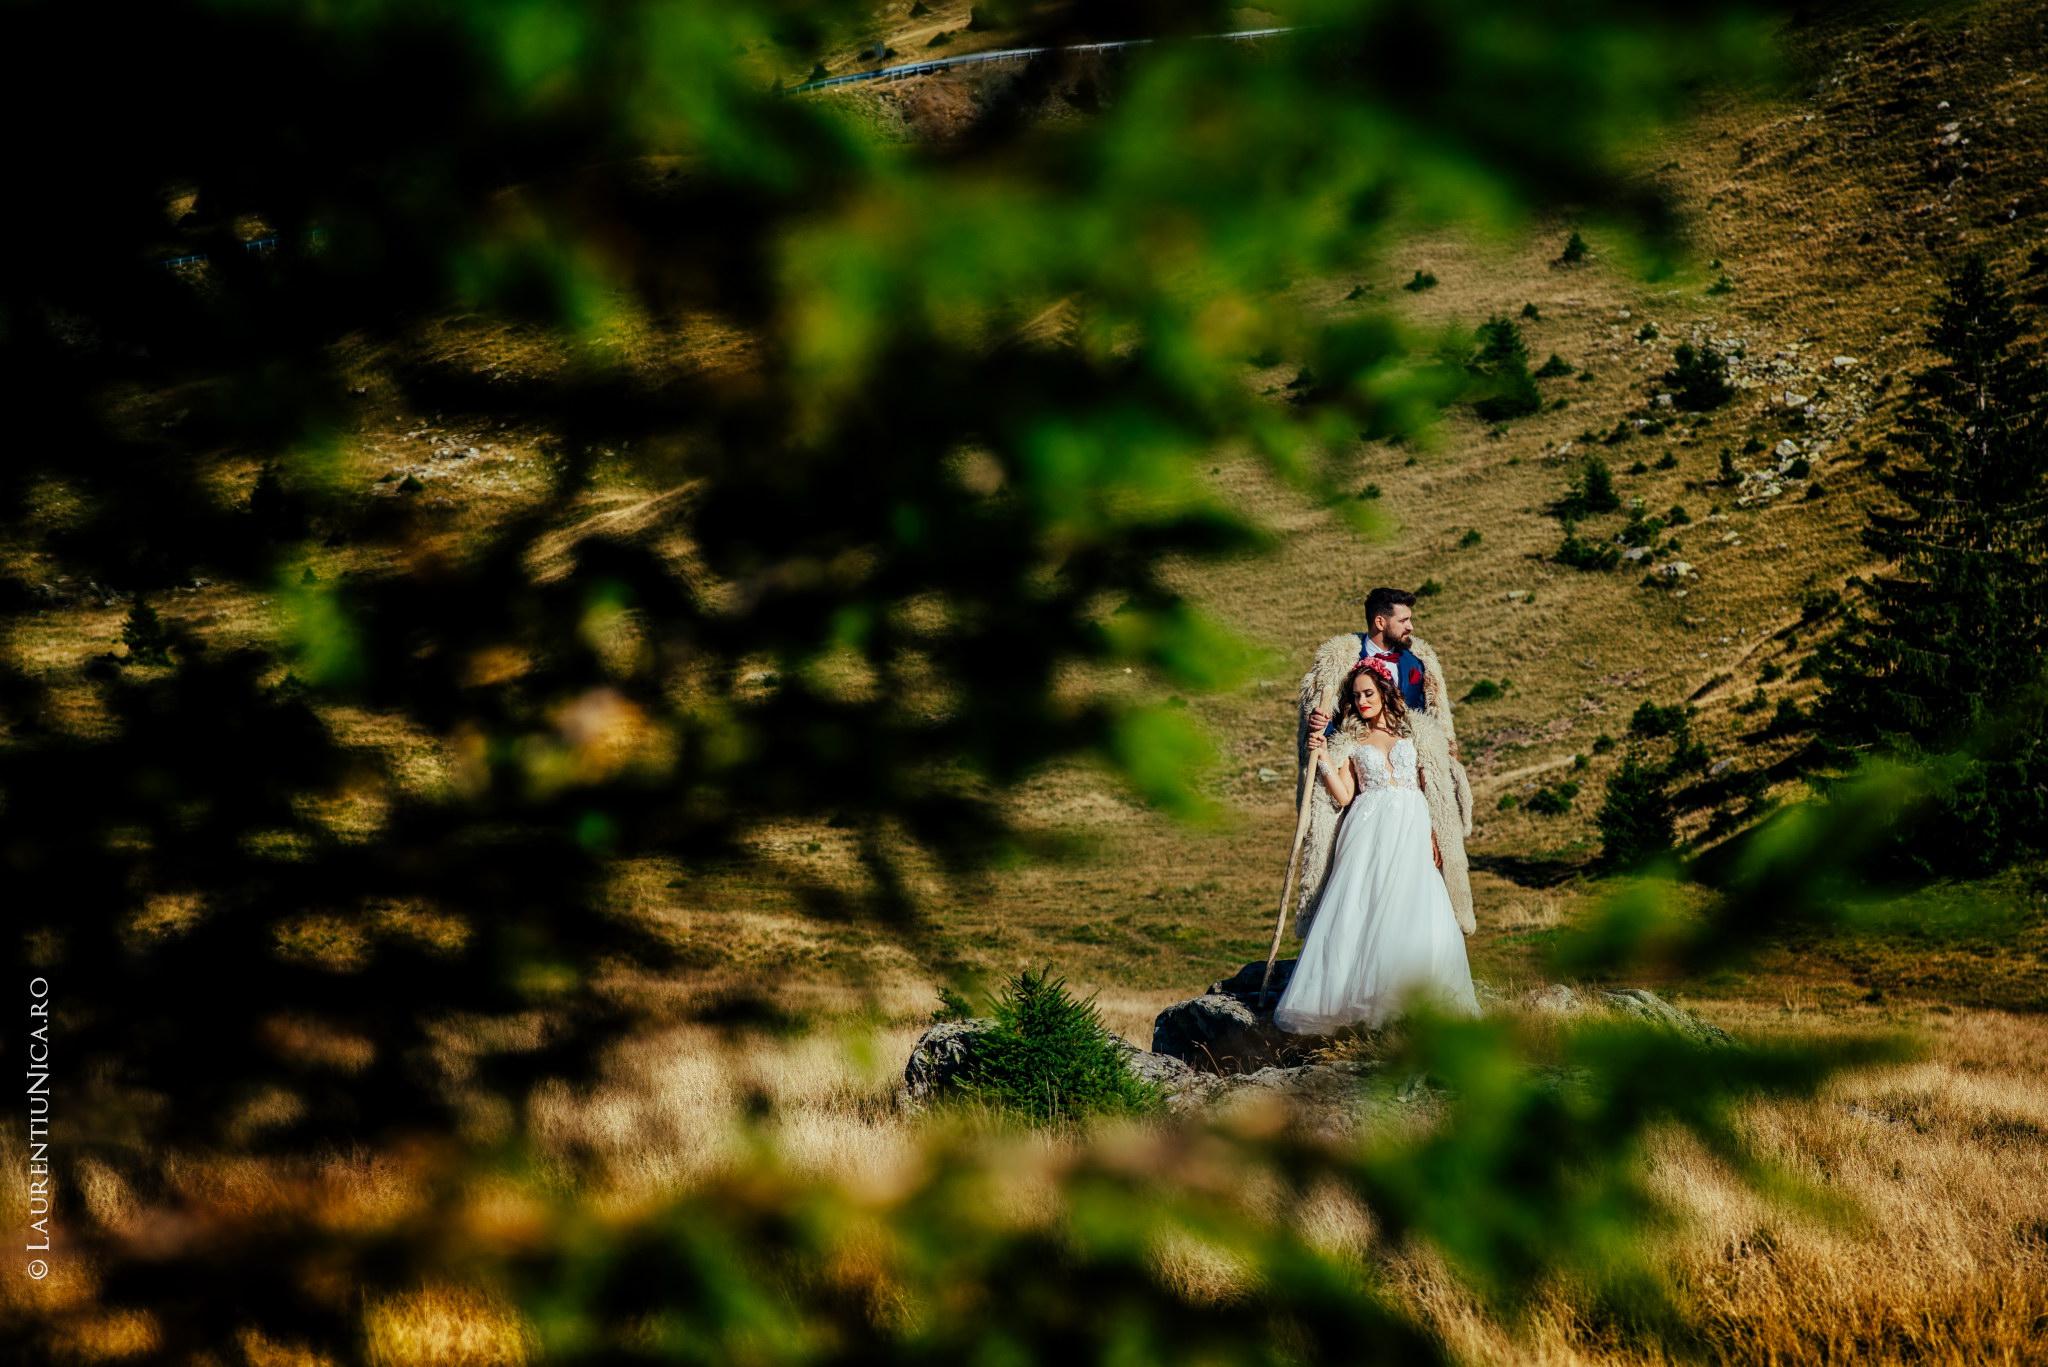 aida si alin fotograf nunta laurentiu nica transalpina 11 - Aida & Alin | Fotografii After Wedding | Transalpina - Muntii Parang